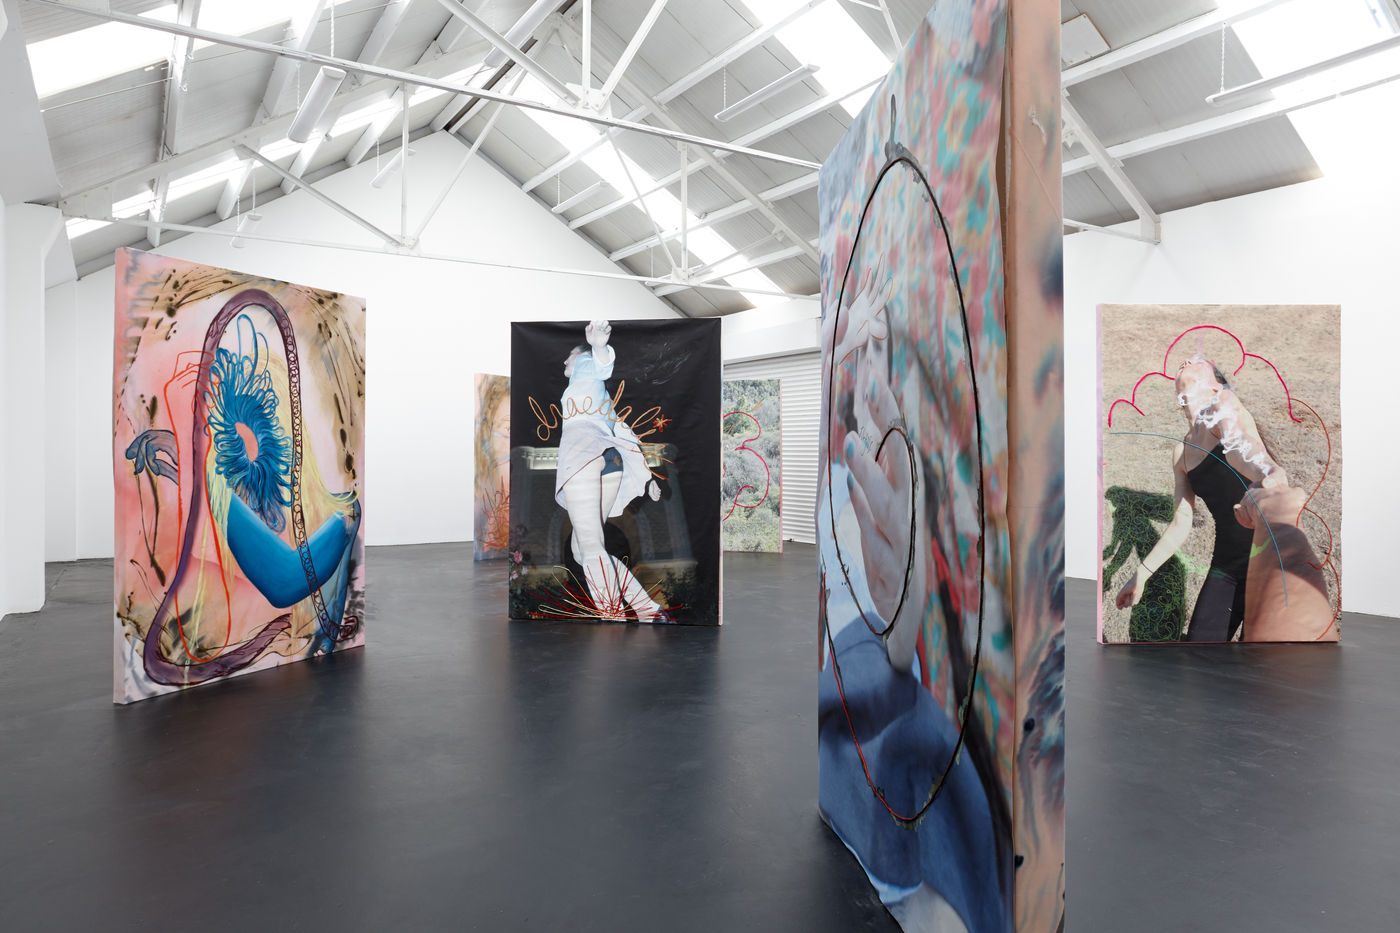 03. Nora Berman - Charm - Installation View III